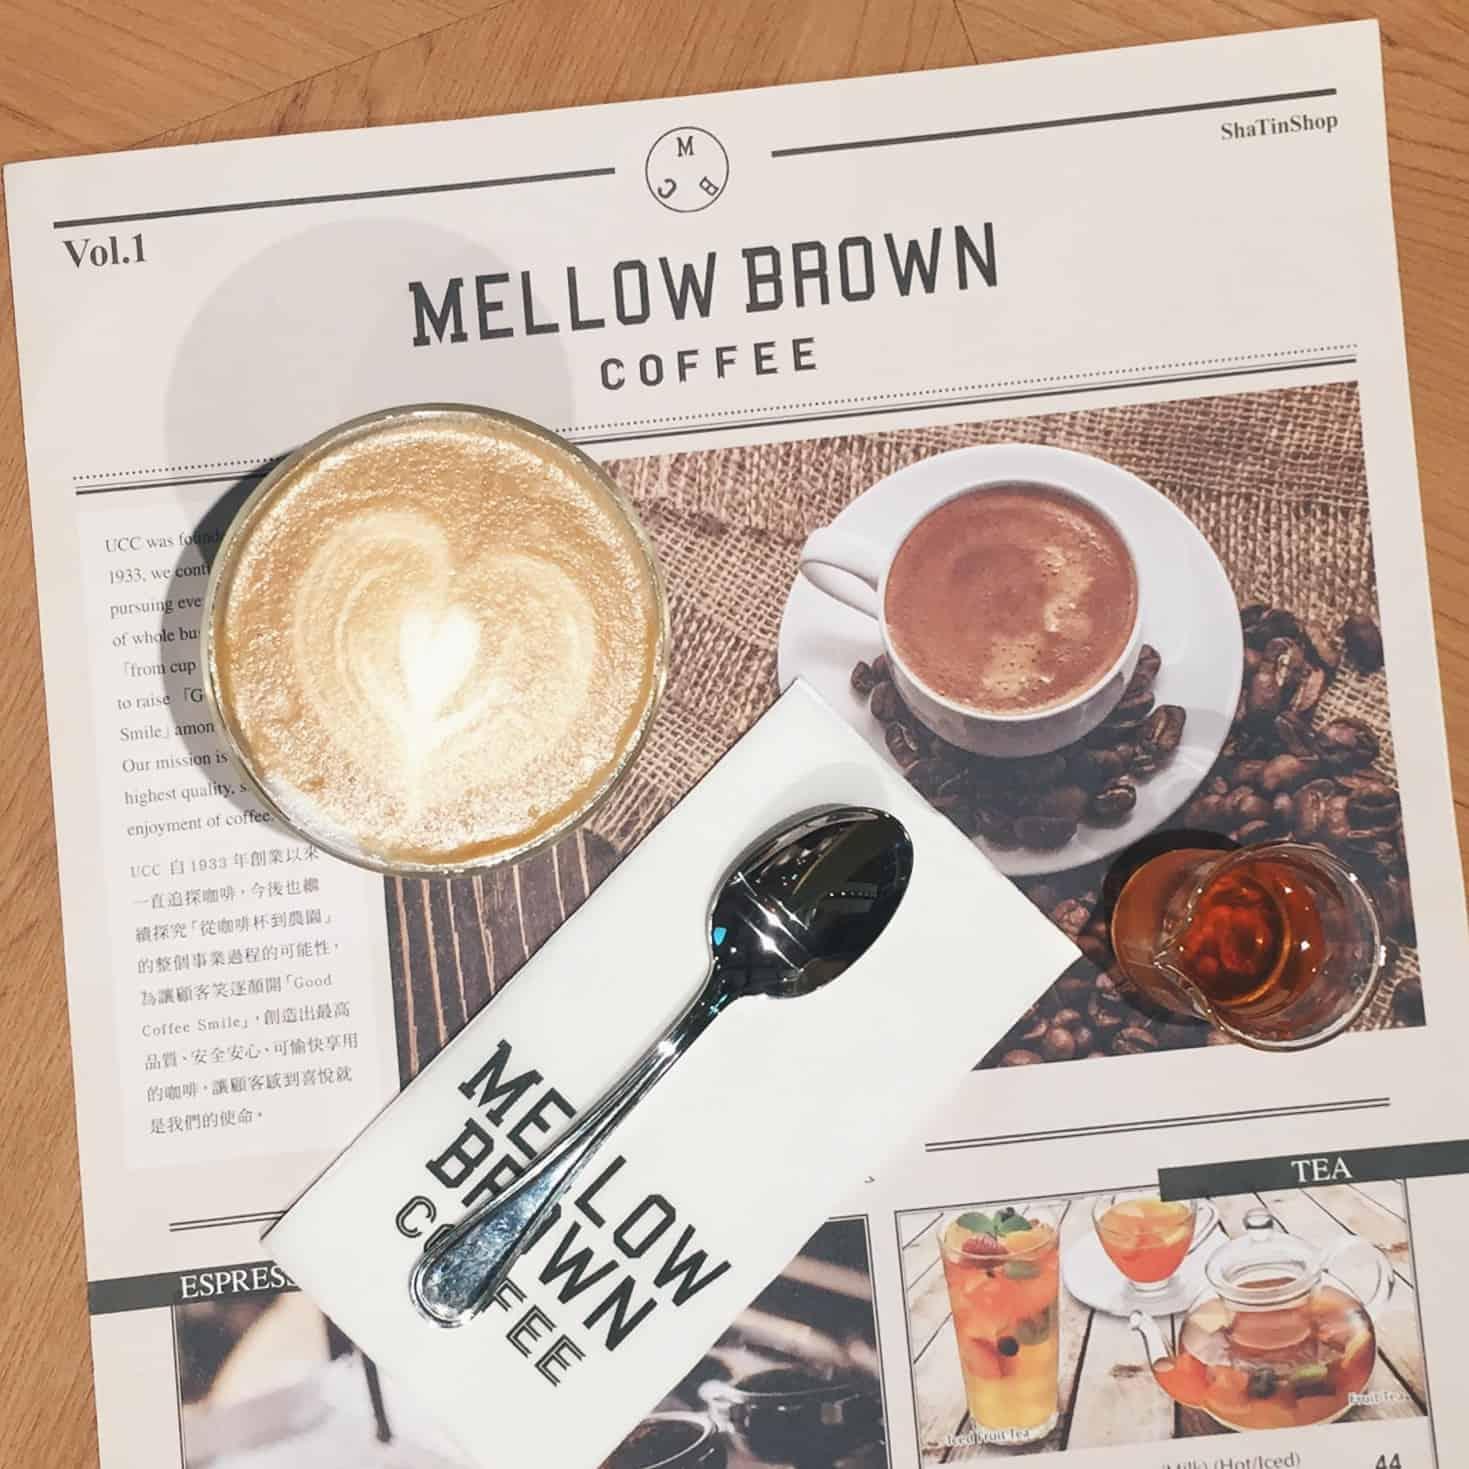 Mellow Brown Coffee Hong Kong